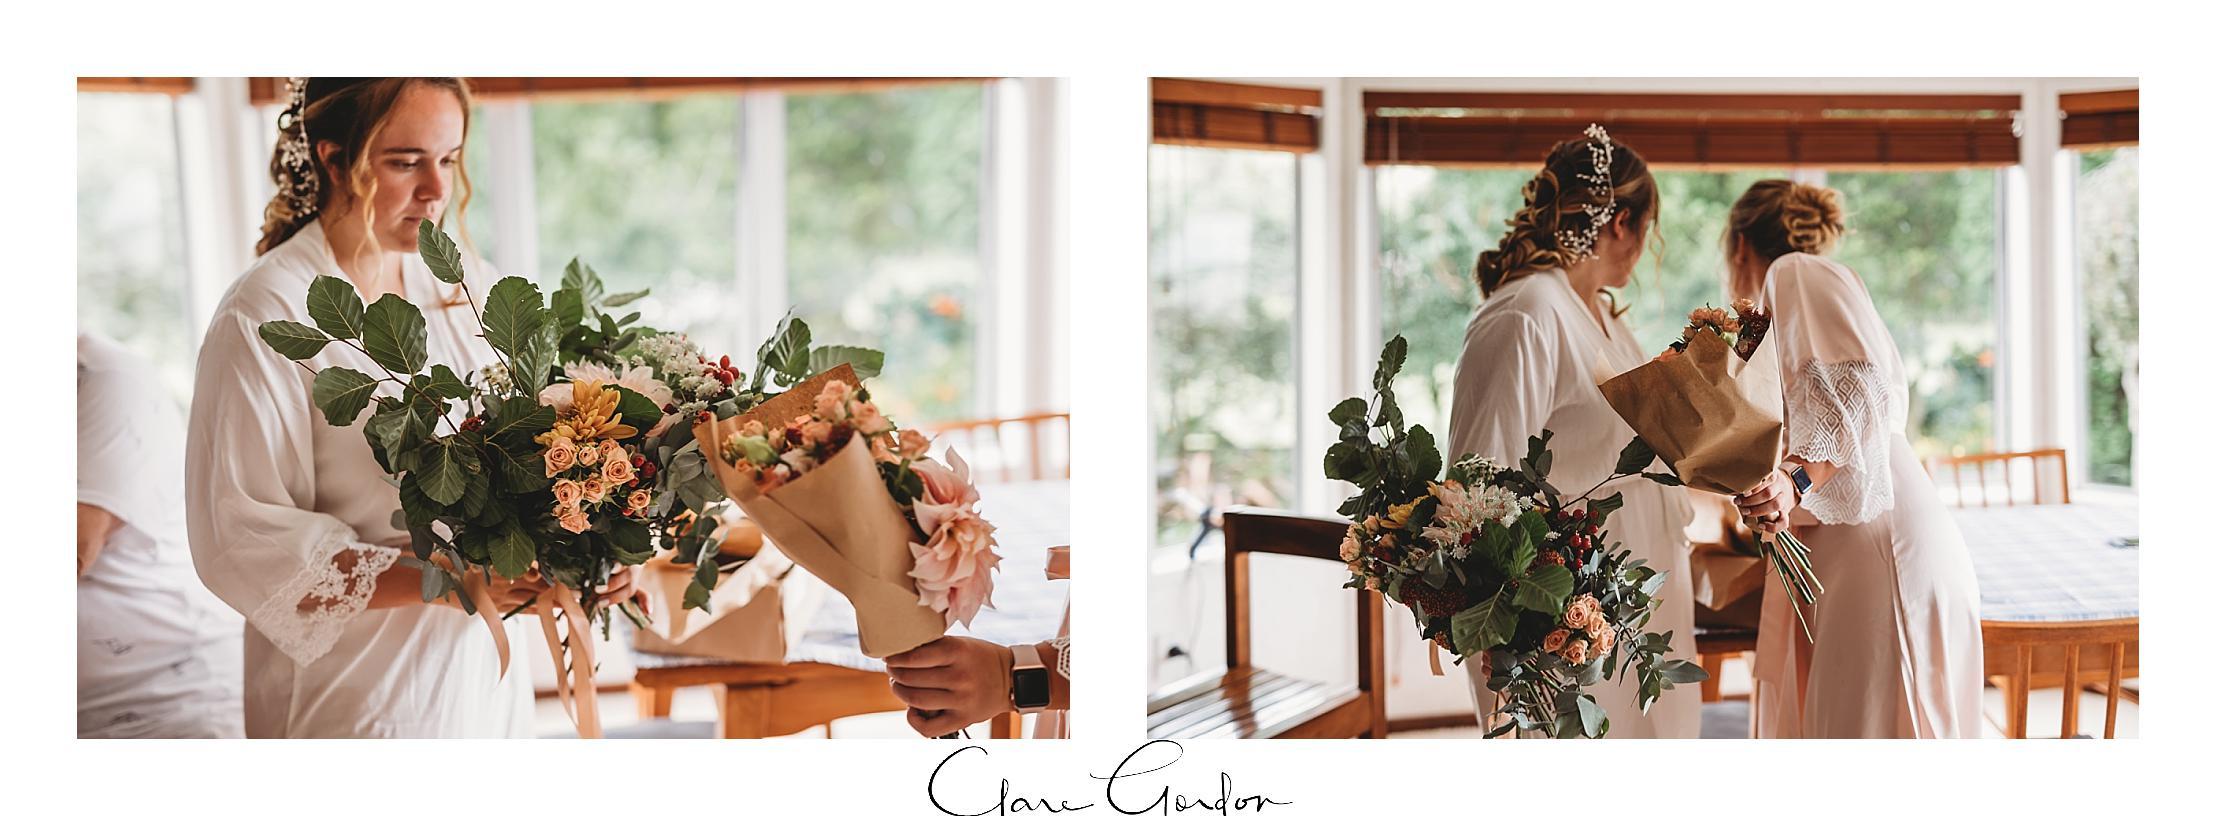 red-barn-wedding-tirau-waikato-wedding (36).jpg